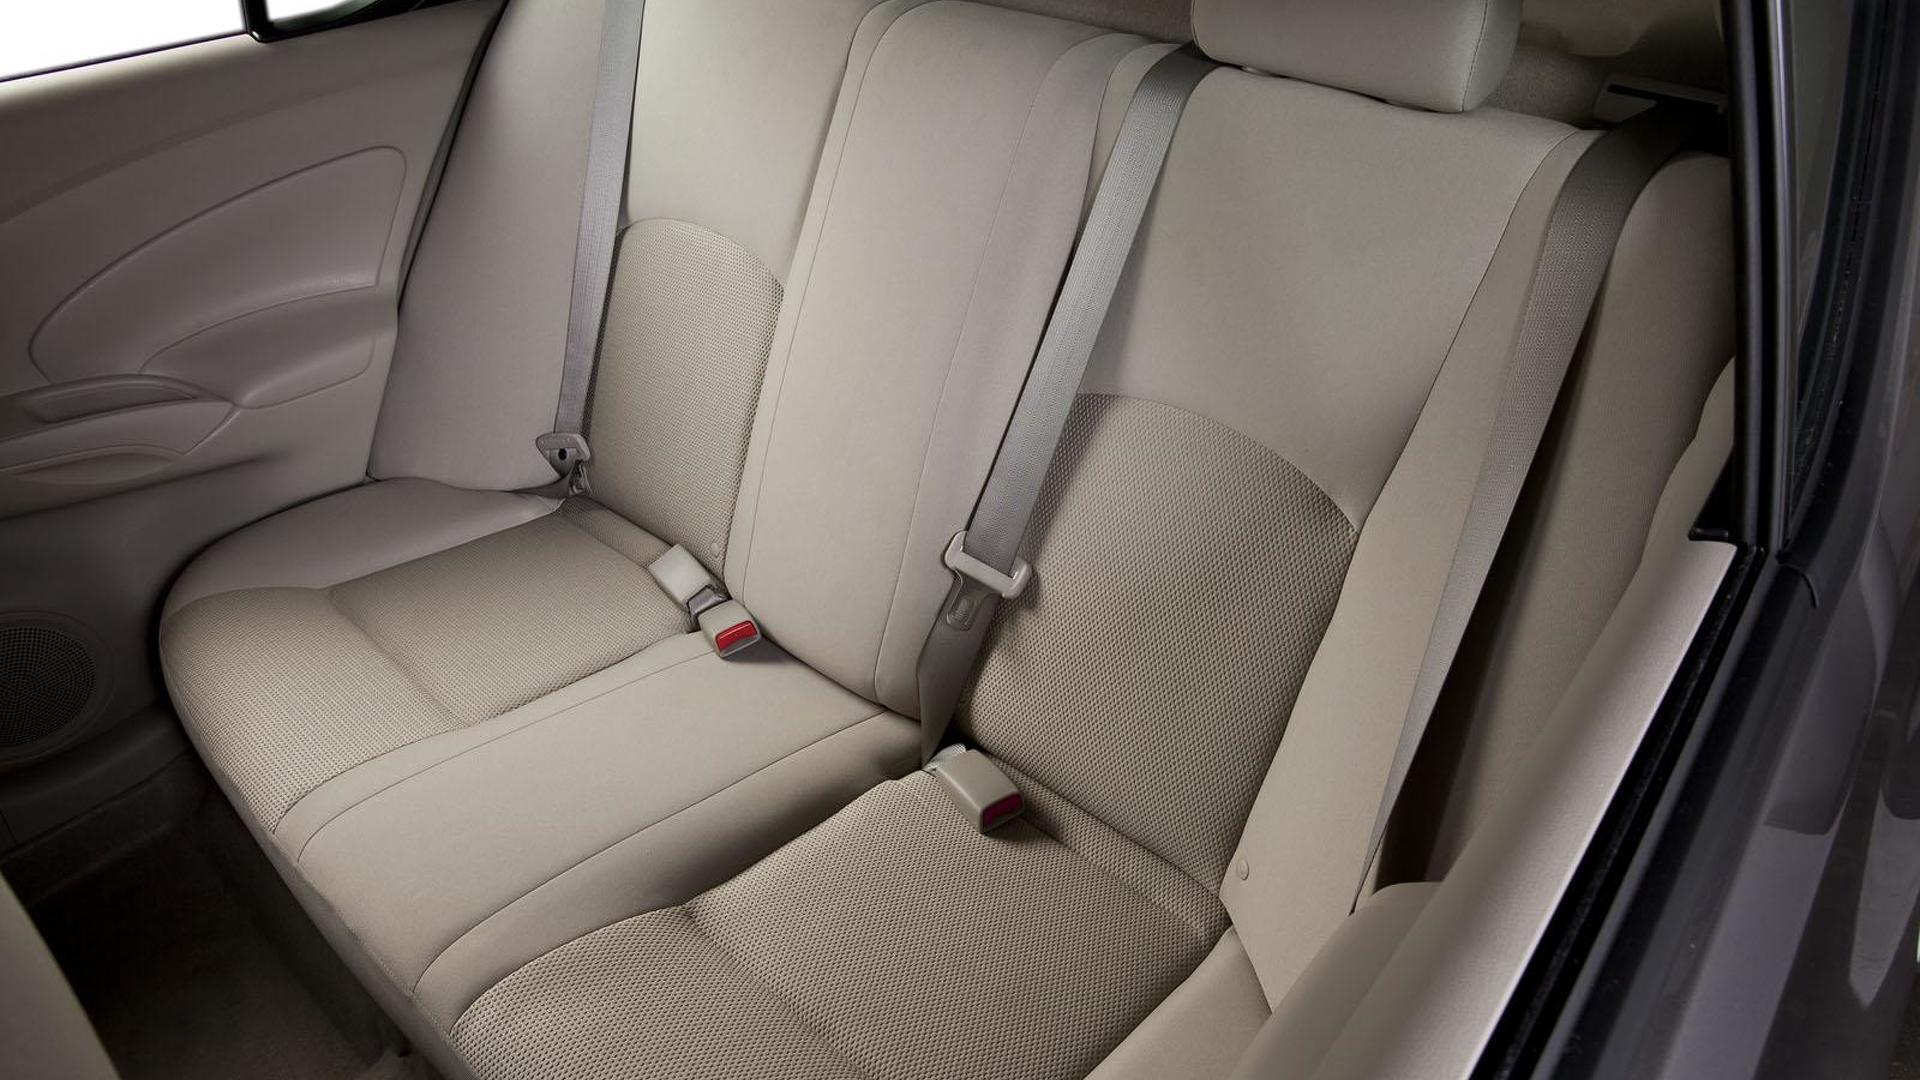 2012 Nissan Versa sedan bows in the Big Apple [video]